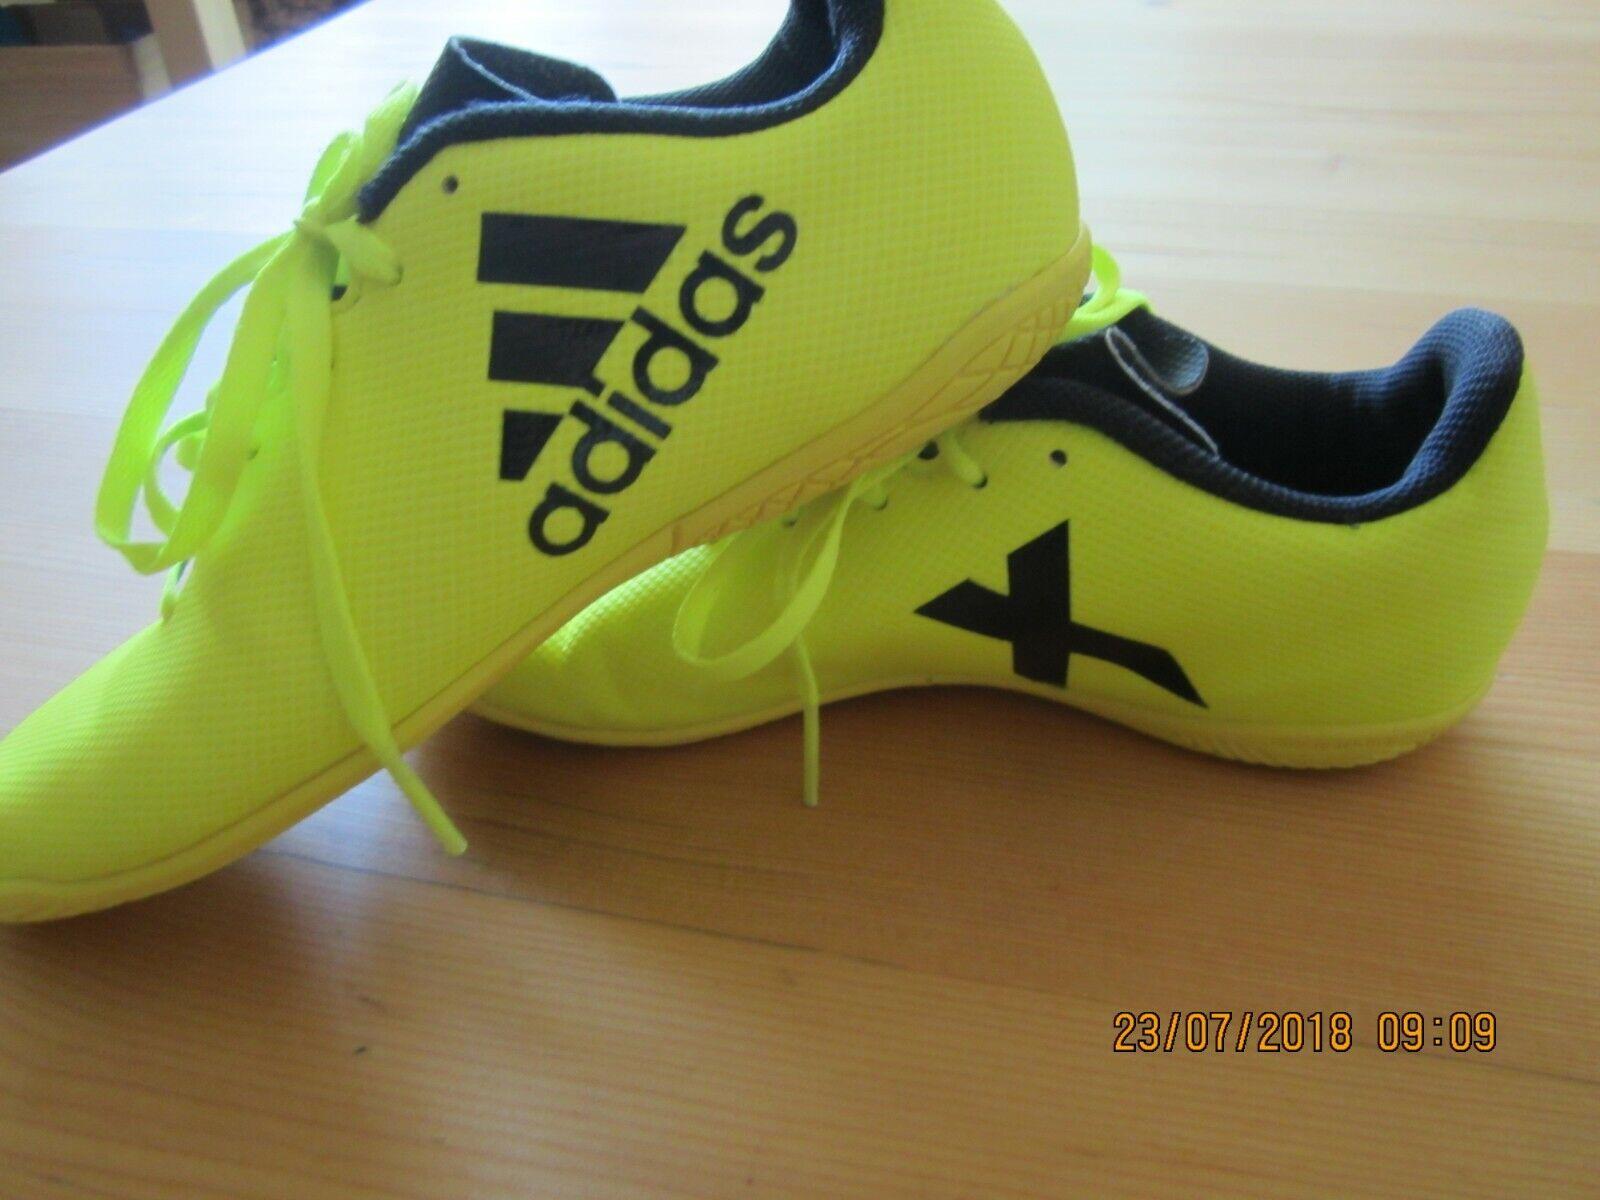 Adidas Schulrucksack Test (Damen & Herren) +++ Top 10 +++